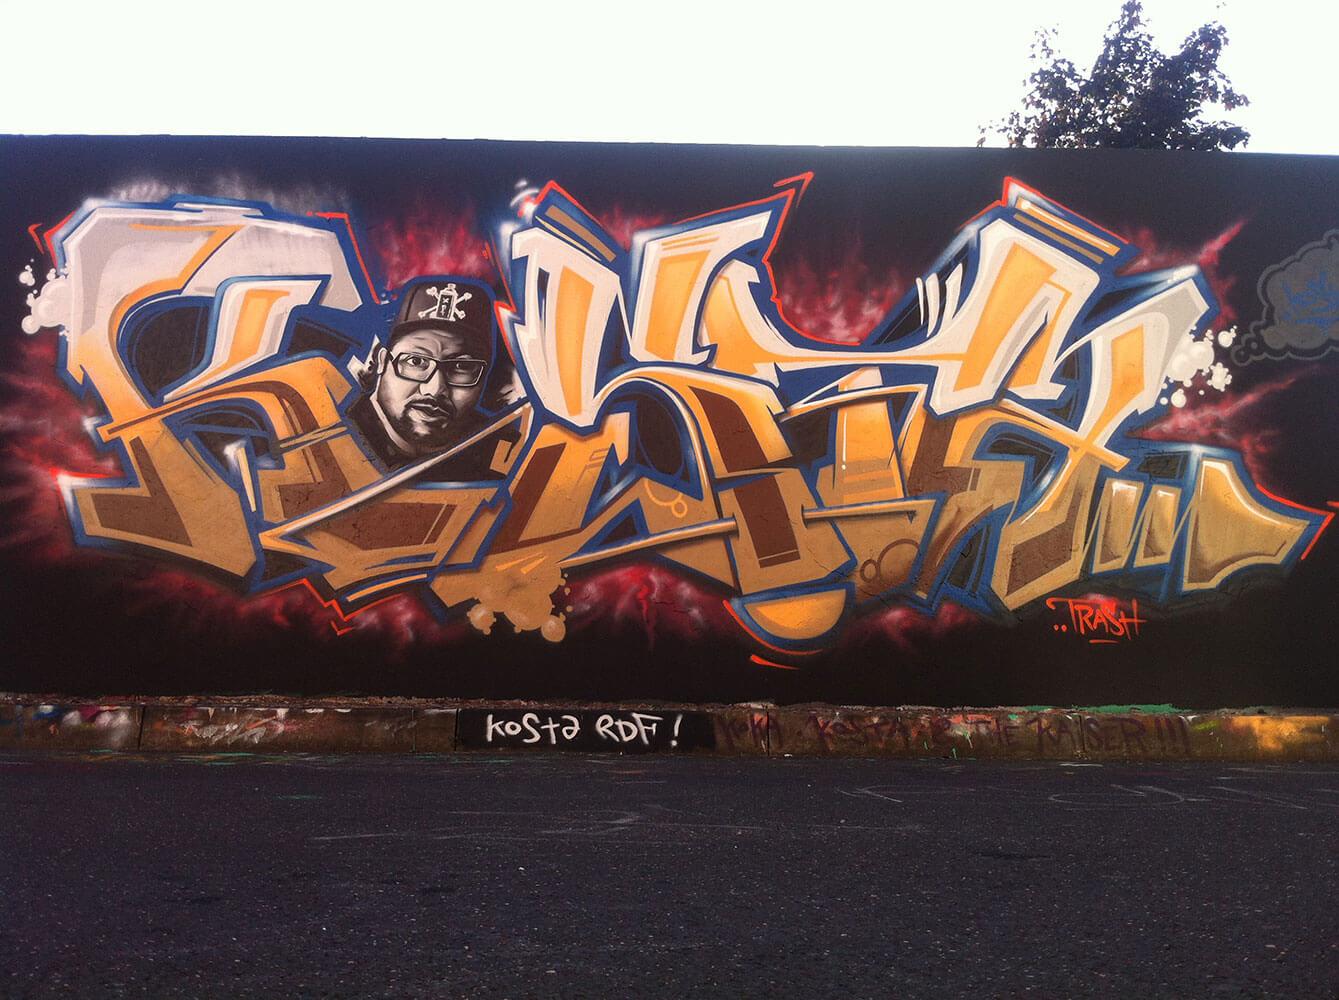 Kosta Graffiti - Max Kosta / Pressenwerk Bad Salzungen 2011